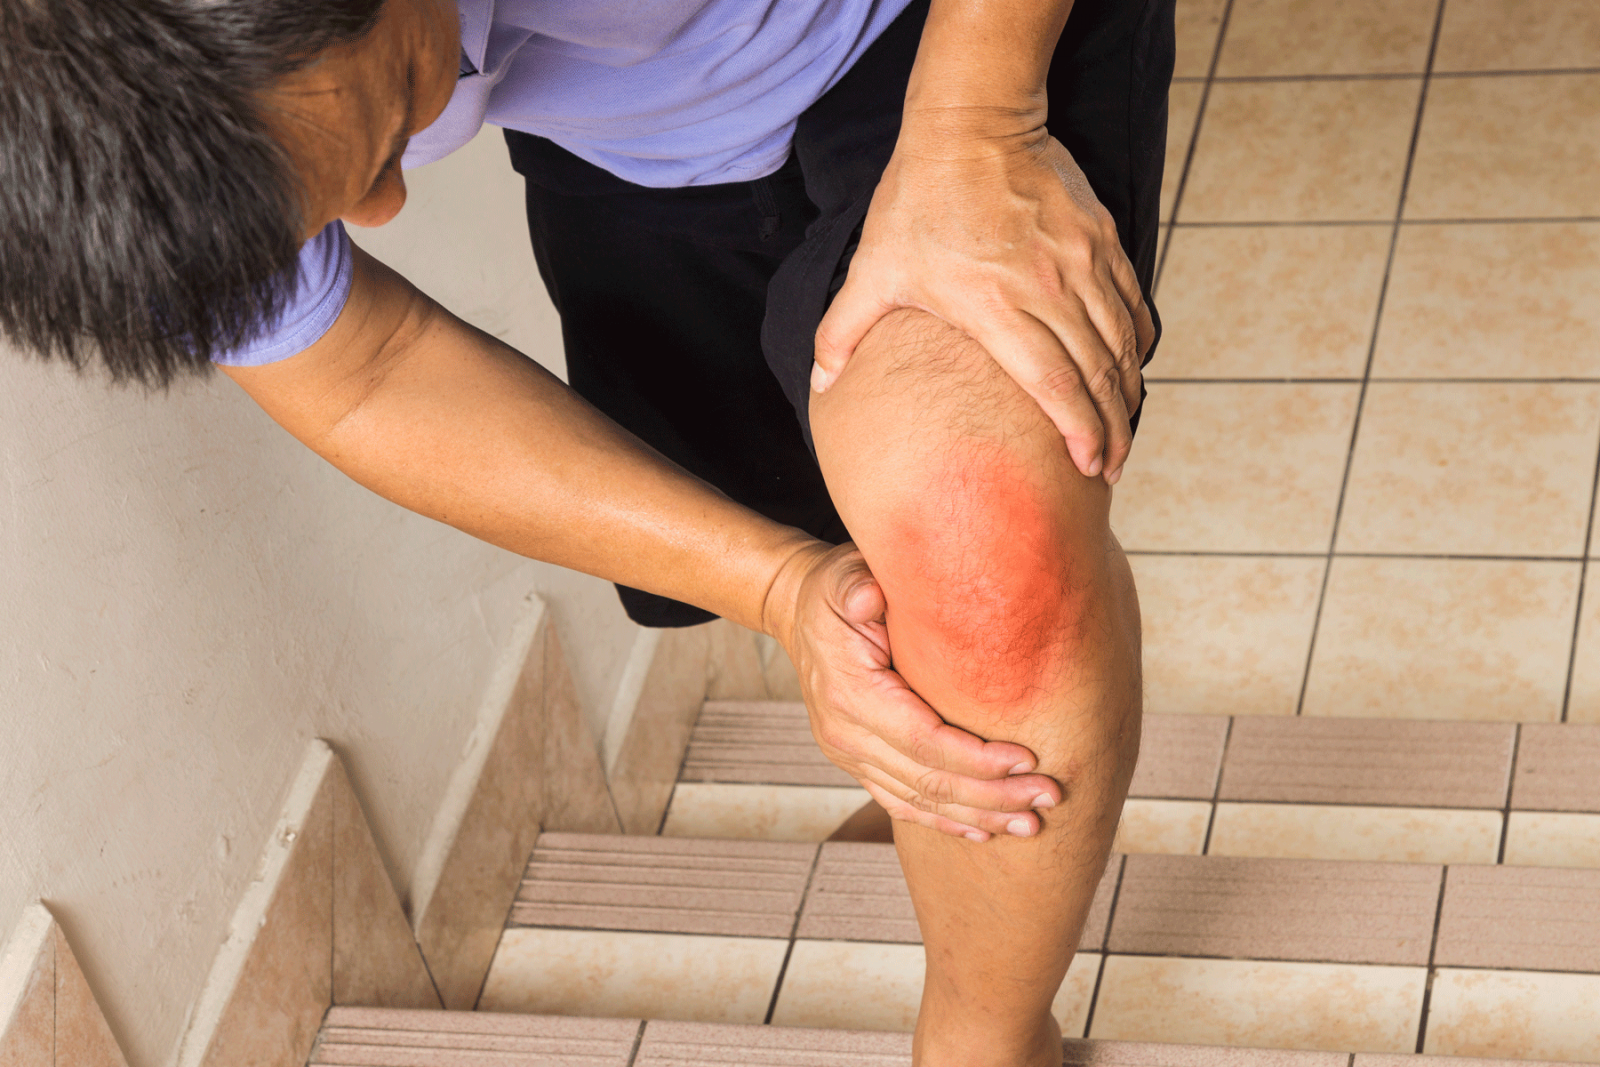 Exercise can ease rheumatoid arthritis pain - Harvard Health